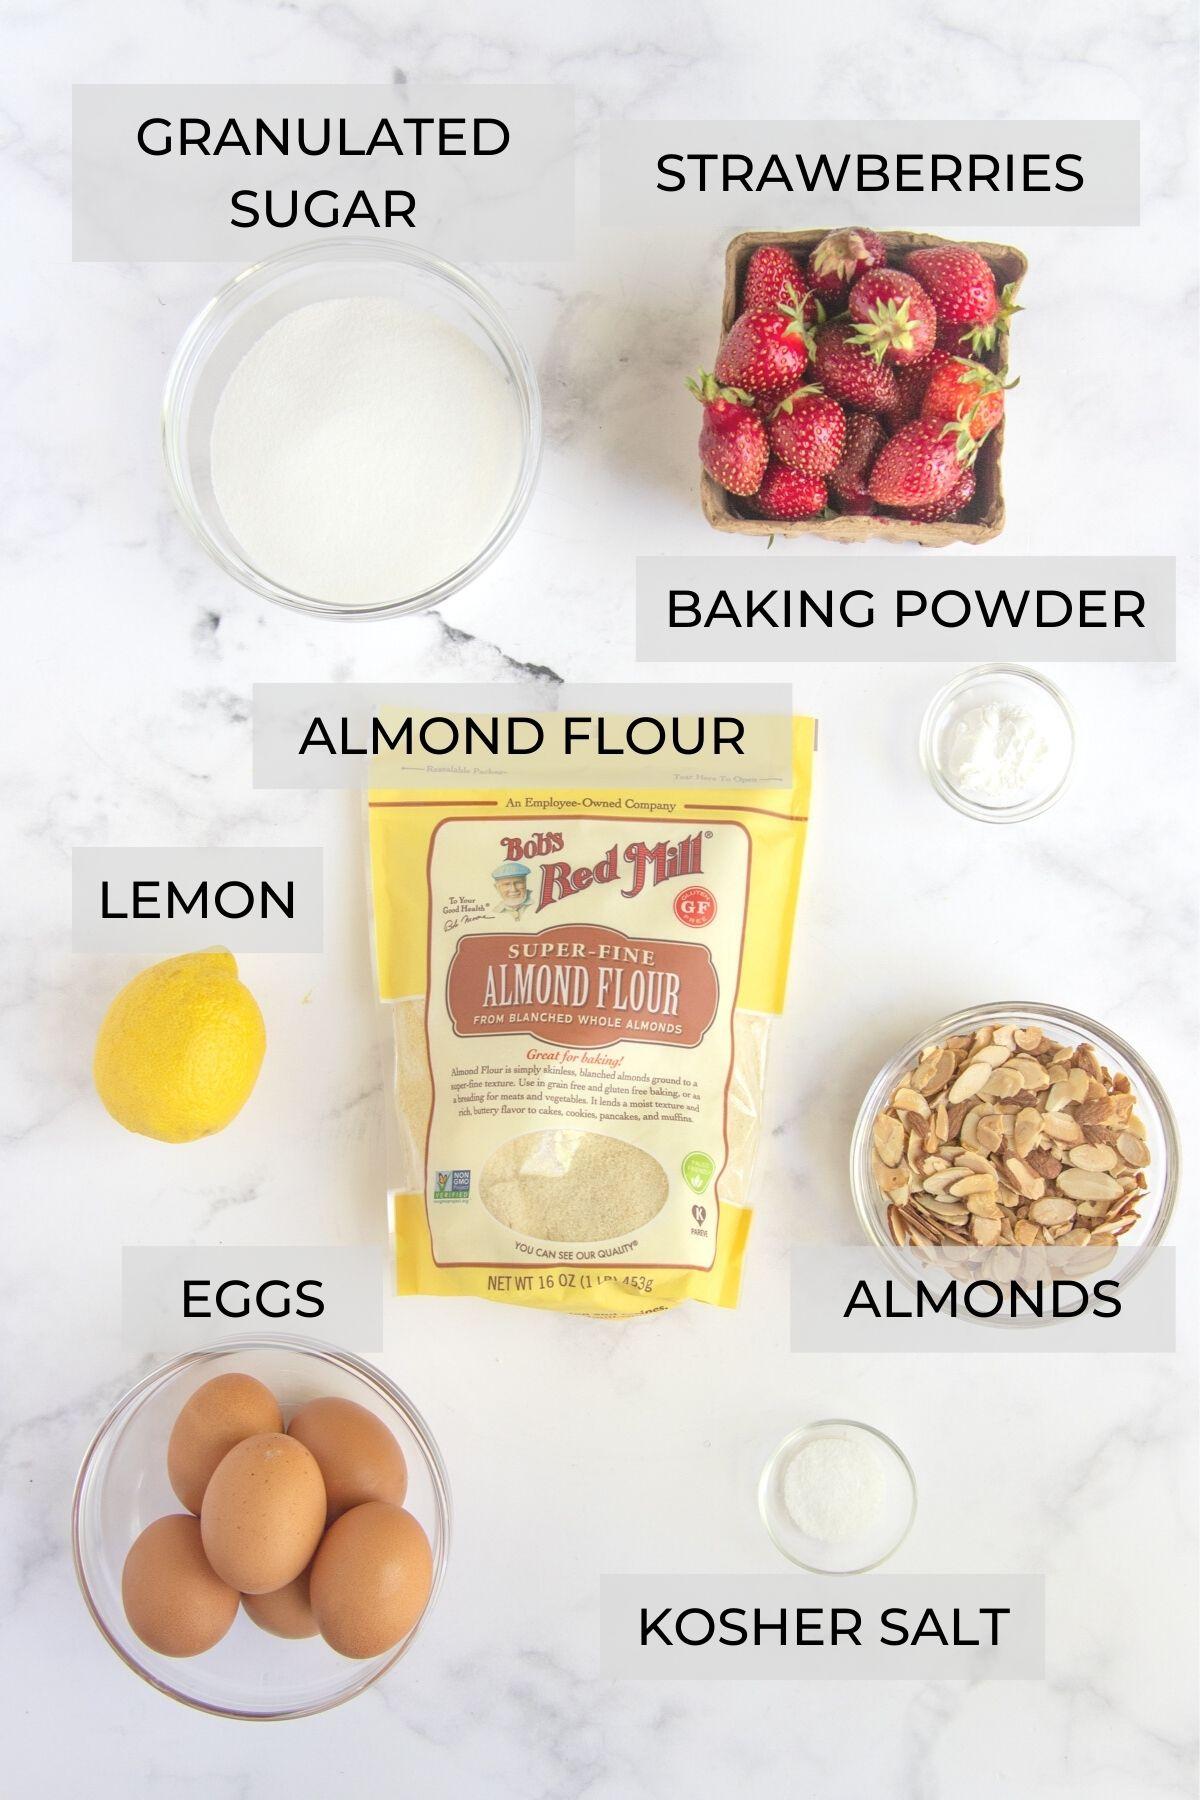 Strawberry Almond Cake Ingredients - Sugar, strawberries, baking powder, almonds. kosher salt, eggs, almond flour and lemon